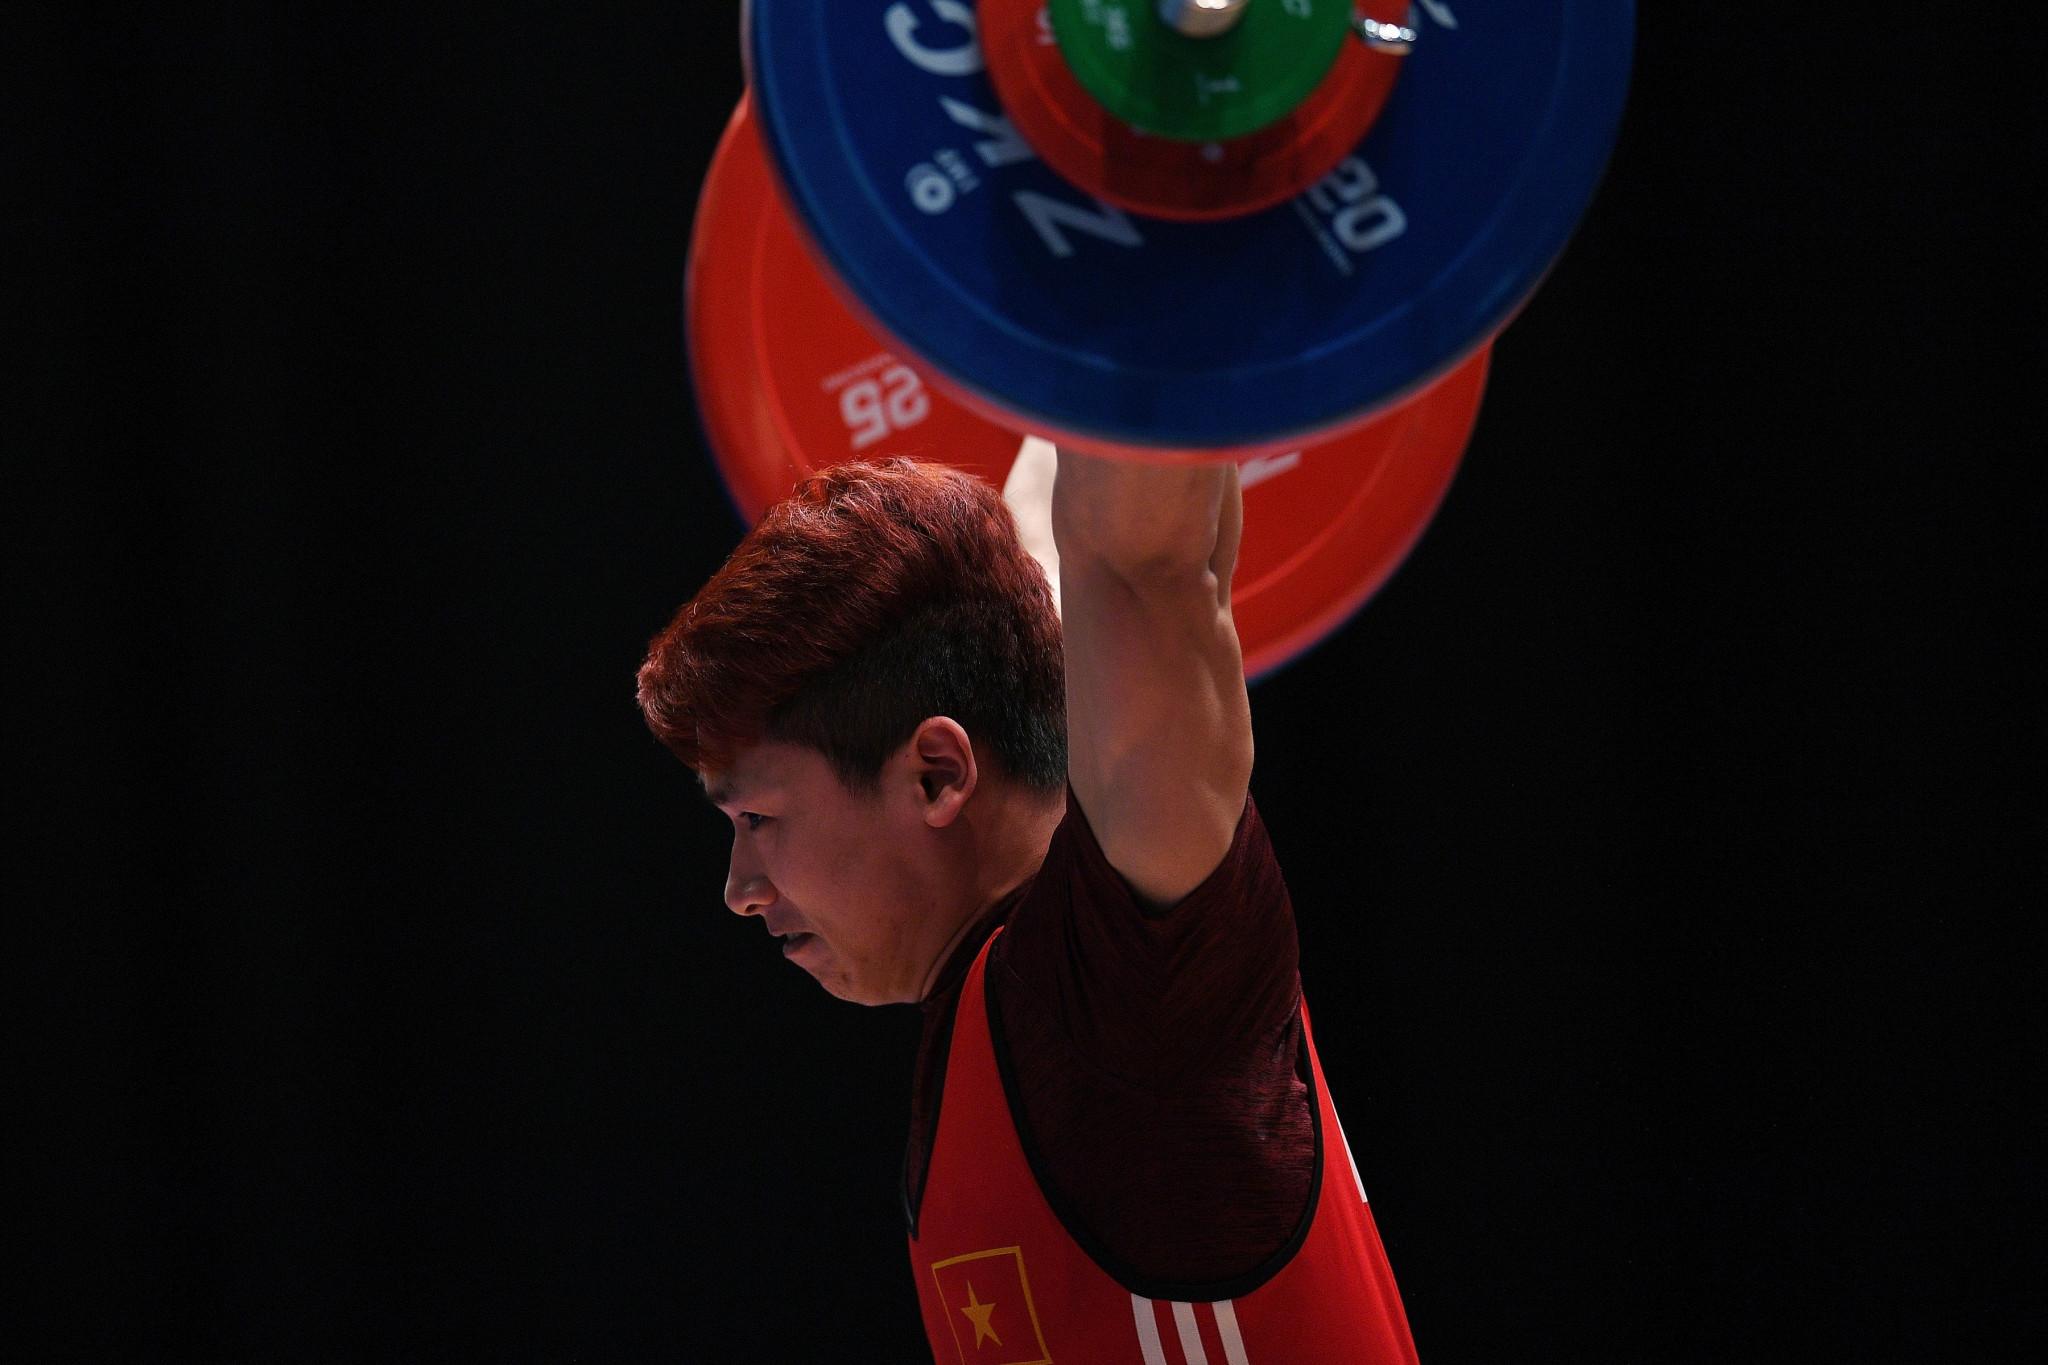 Vietnam's Trinh Van Vinh won the men's 62kg gold medal ©Getty Images